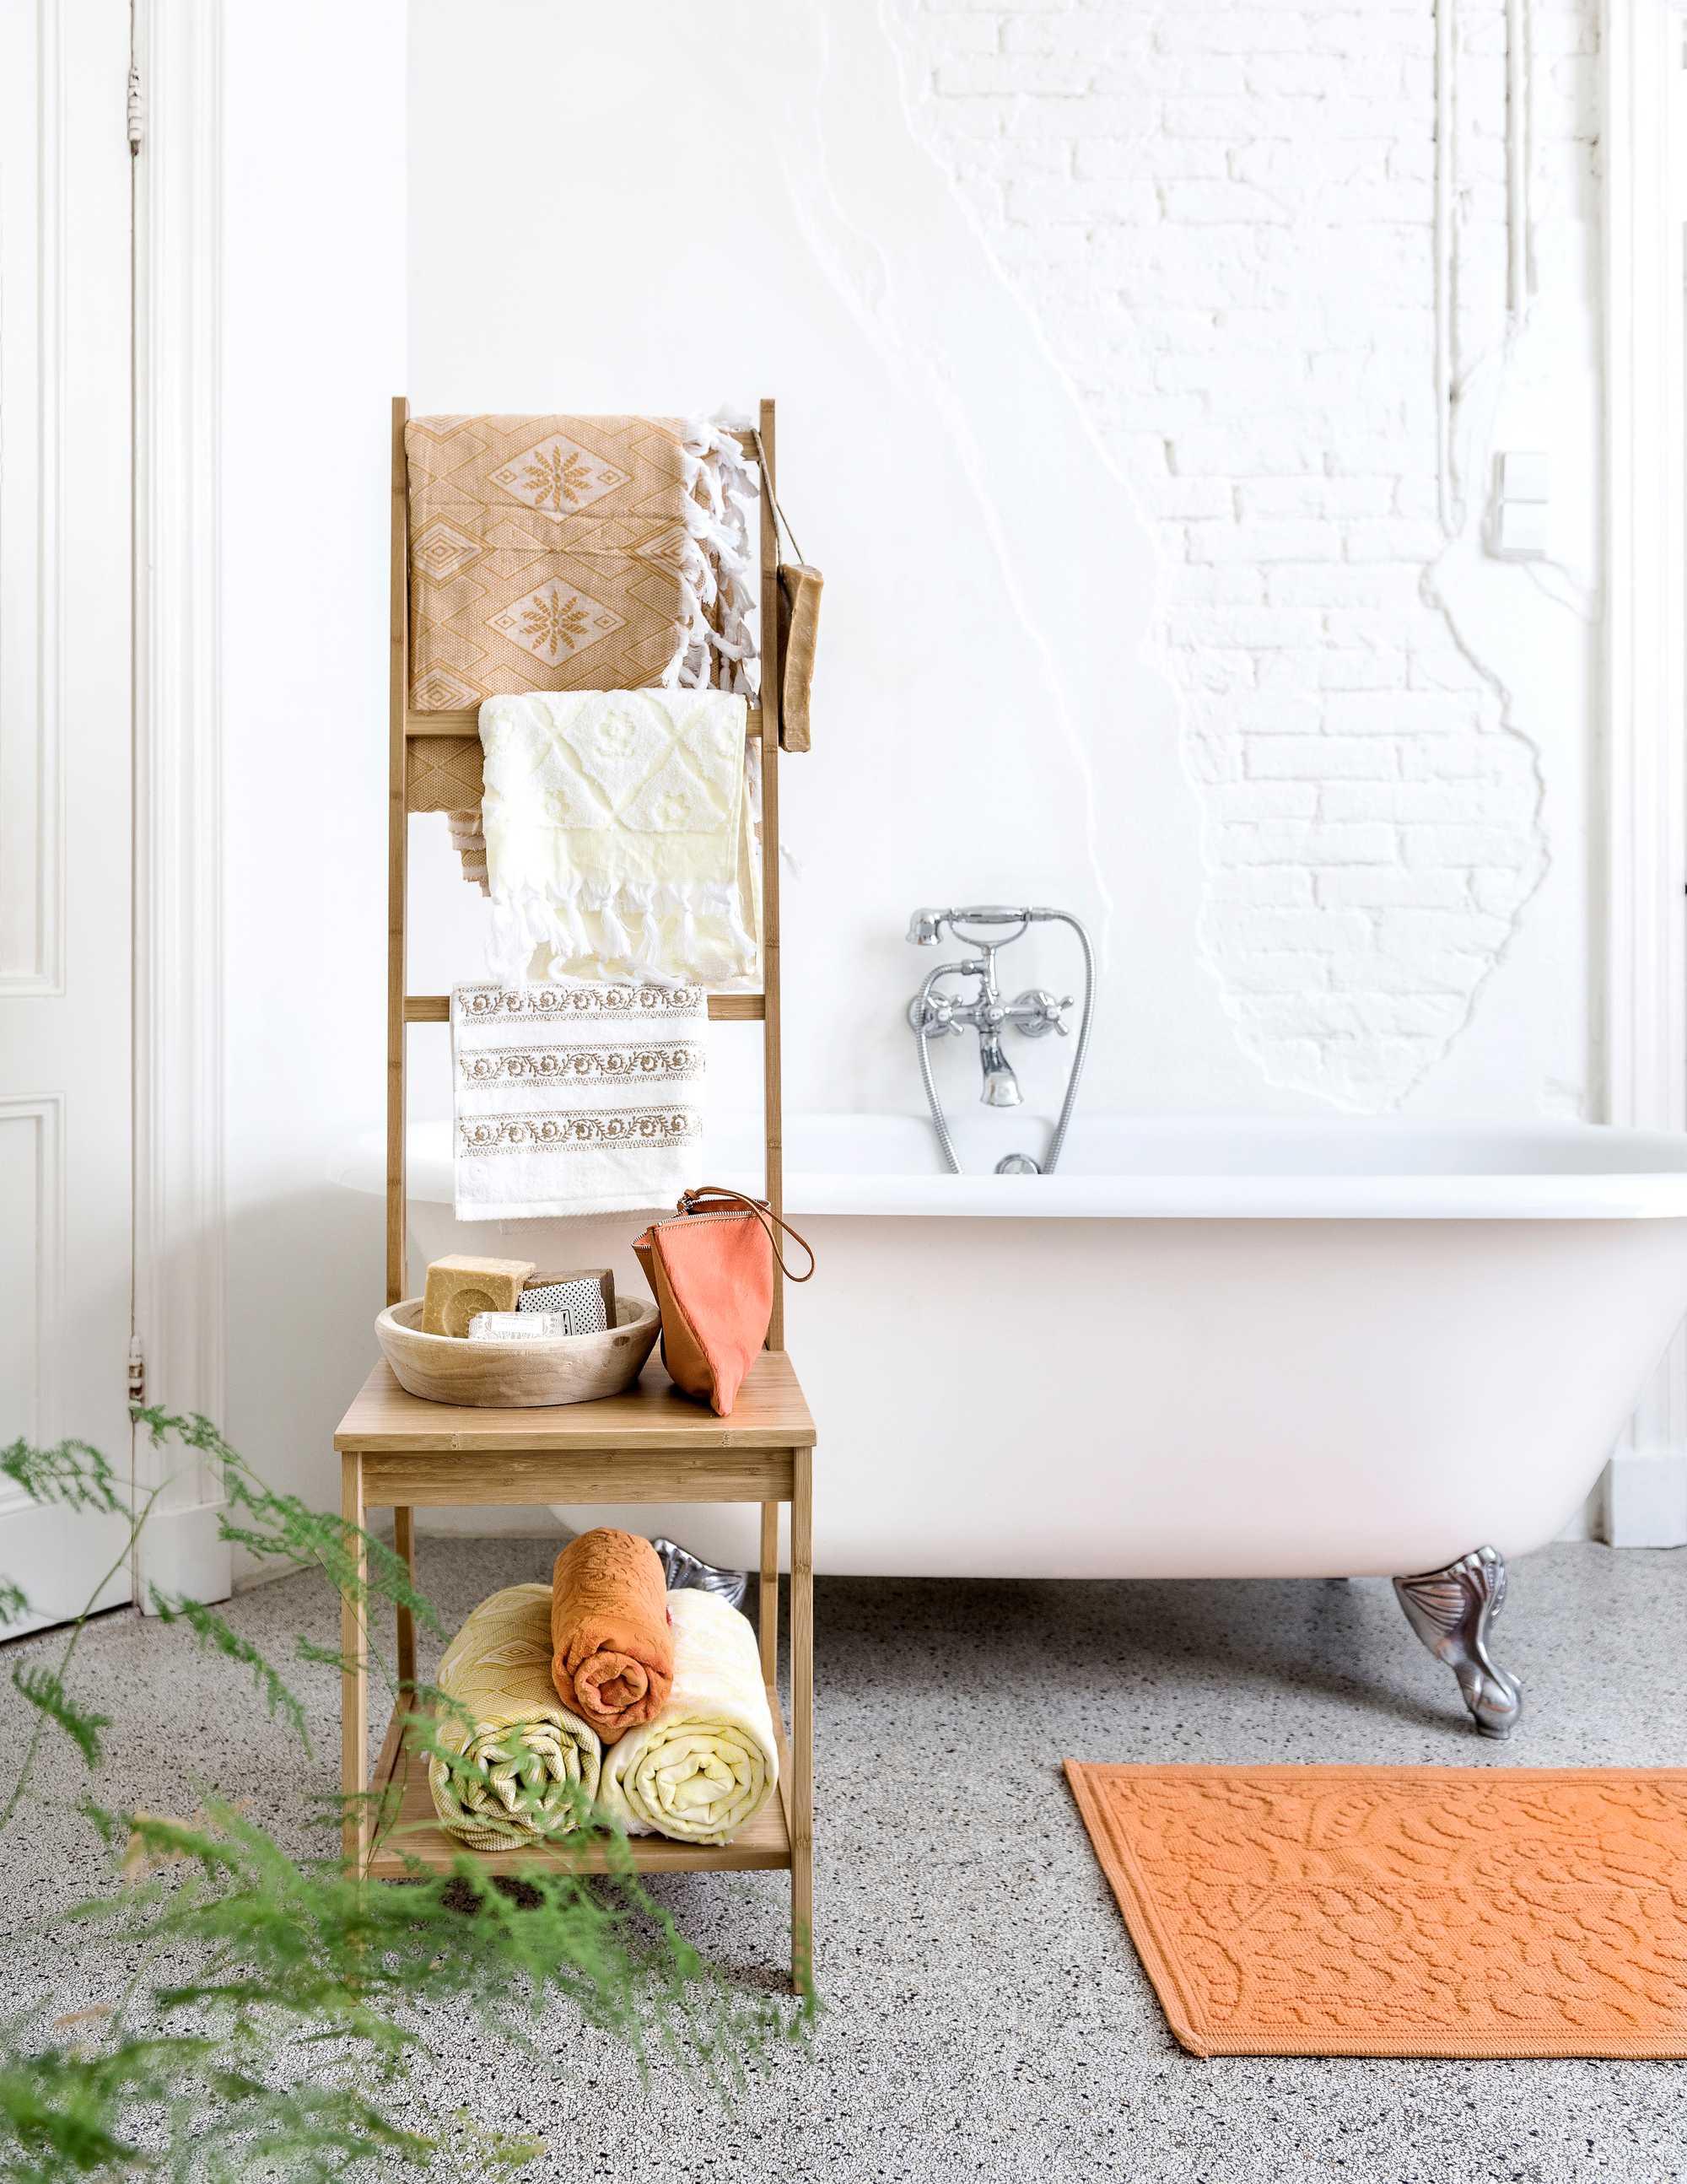 badkamer - zon